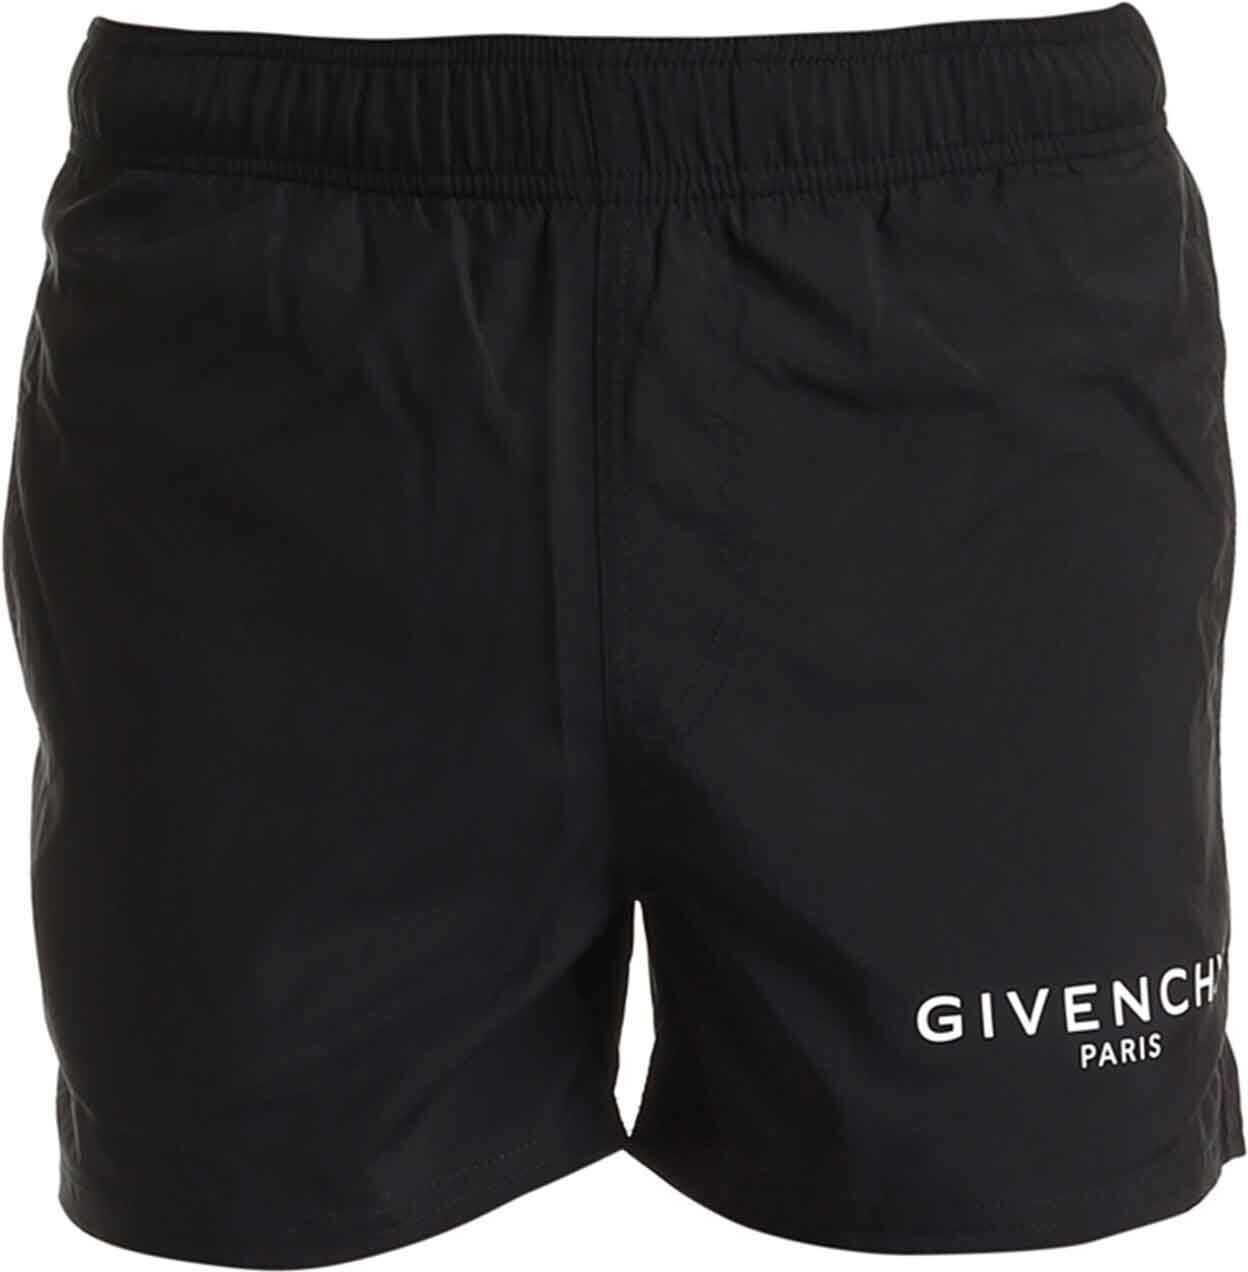 Givenchy Givenchy Printed Swim Short In Black Black imagine